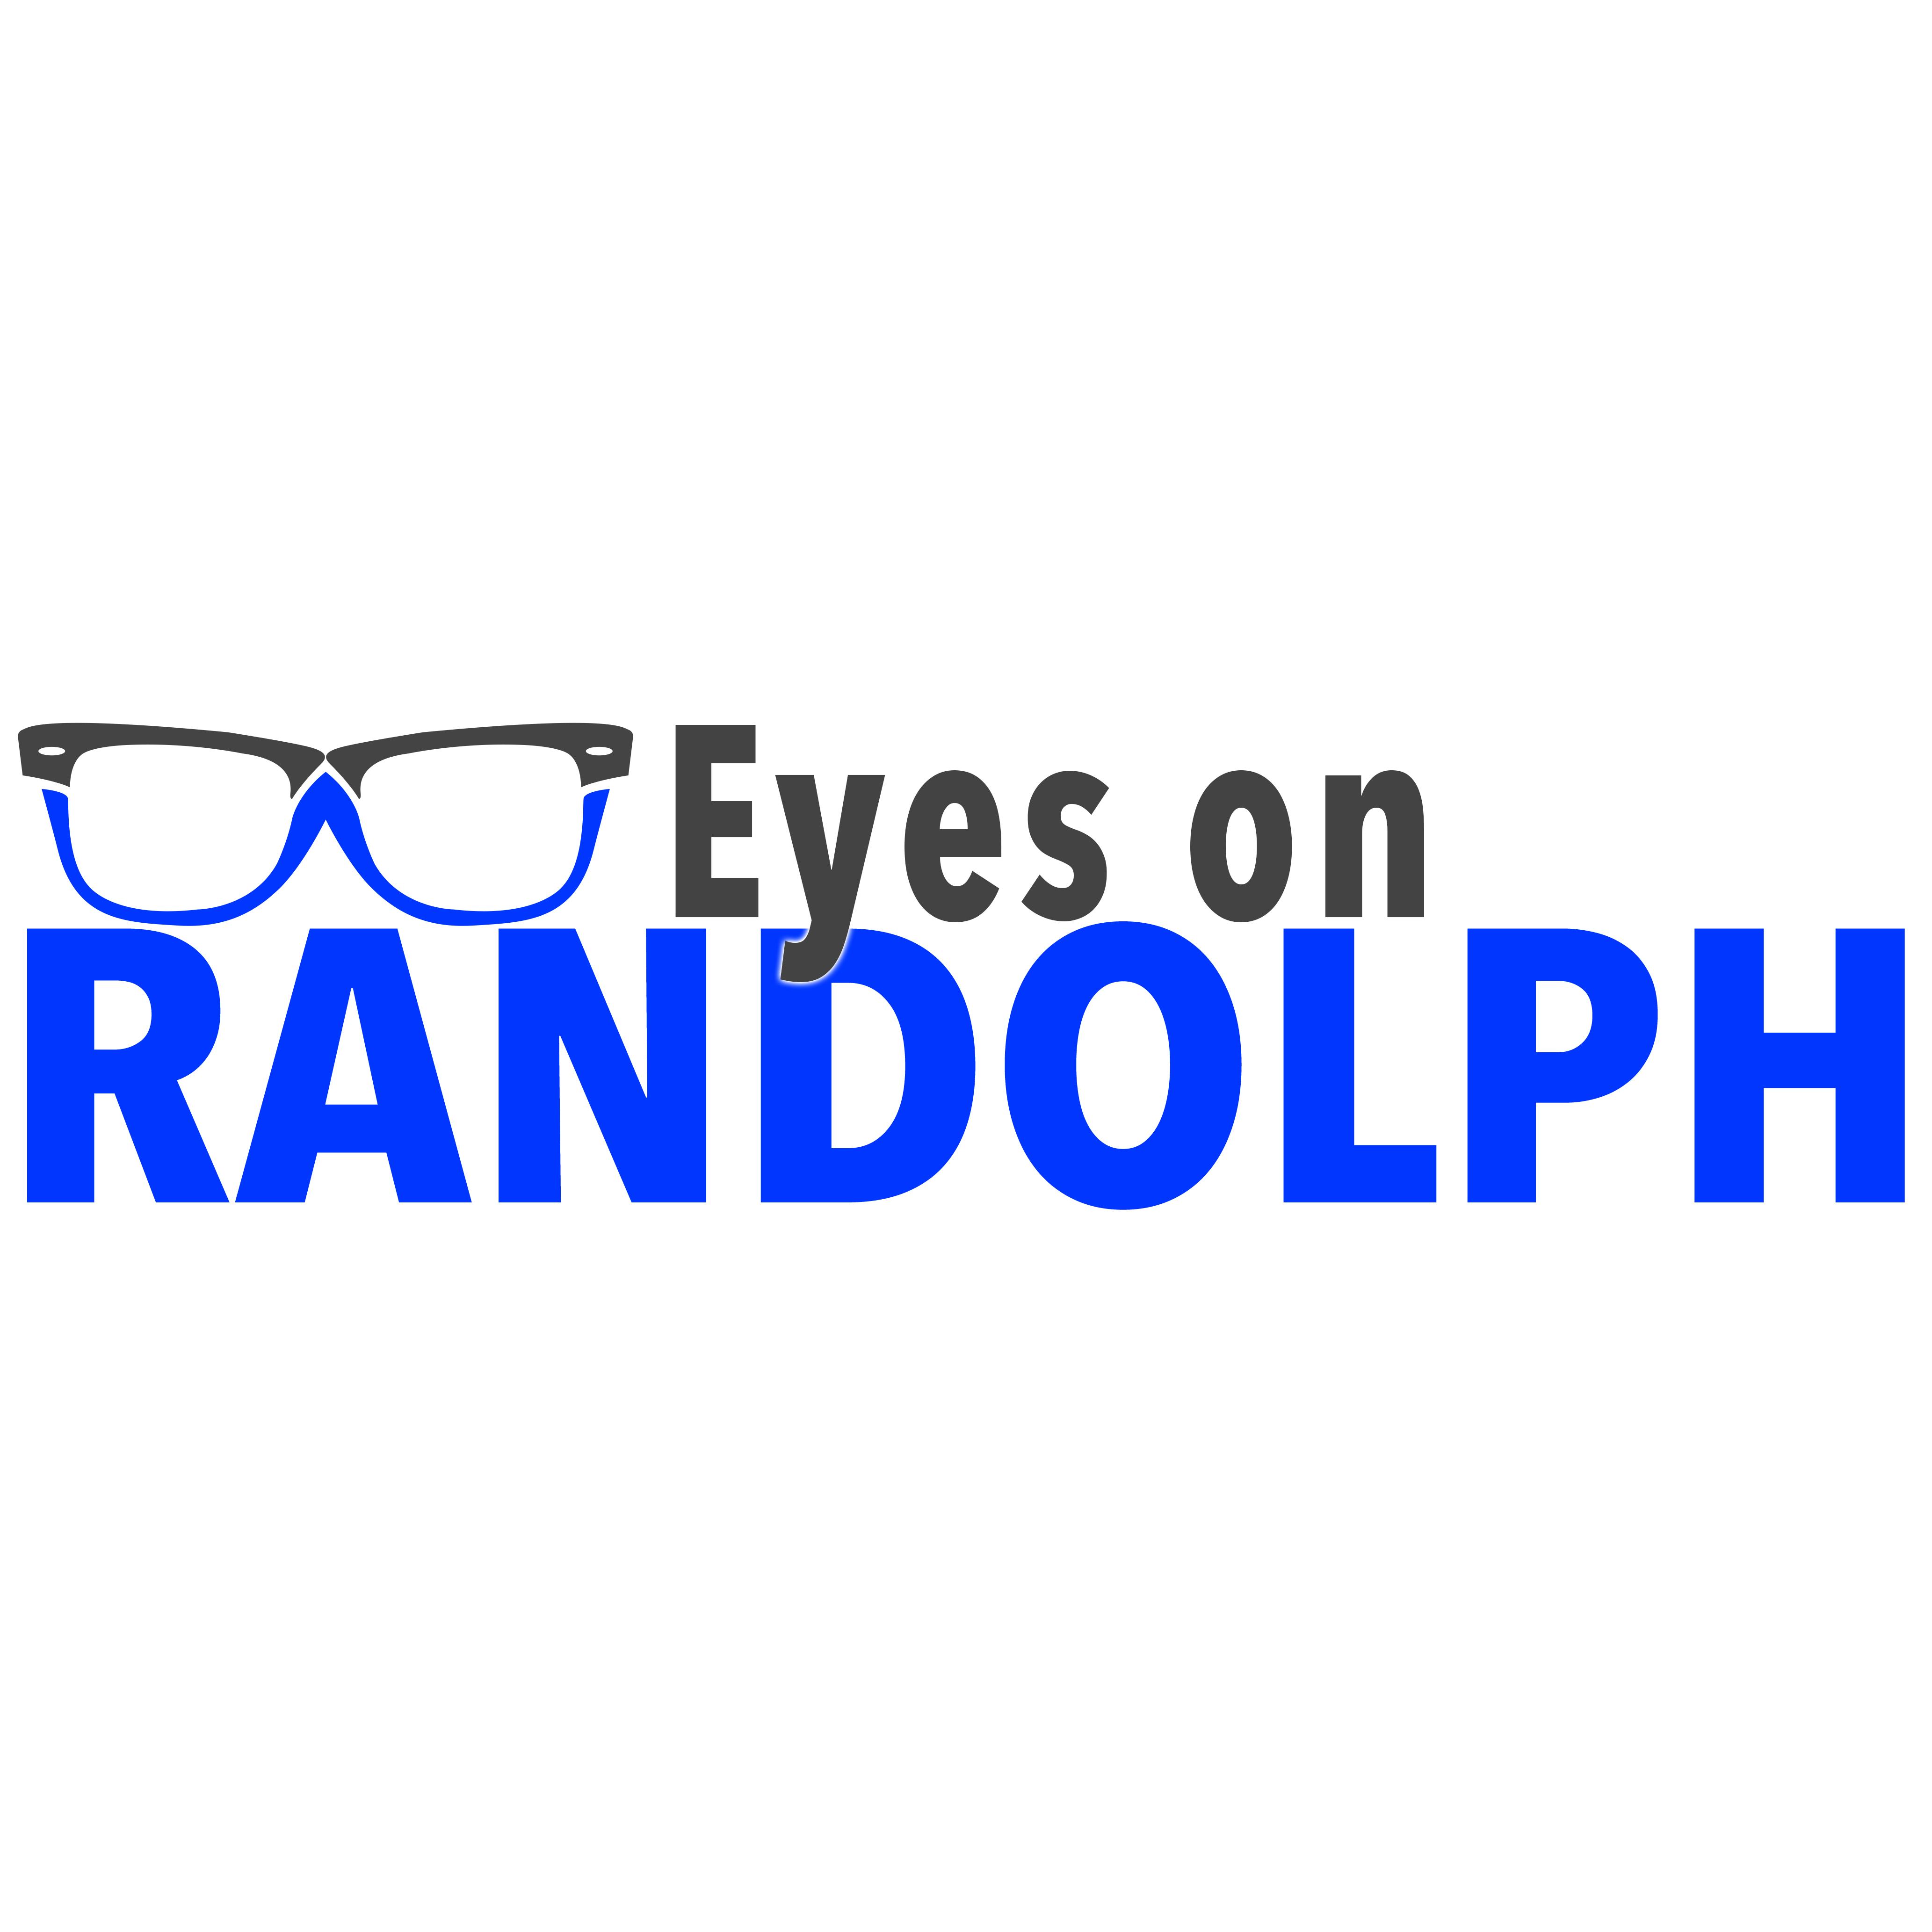 Eyes on Randolph image 1